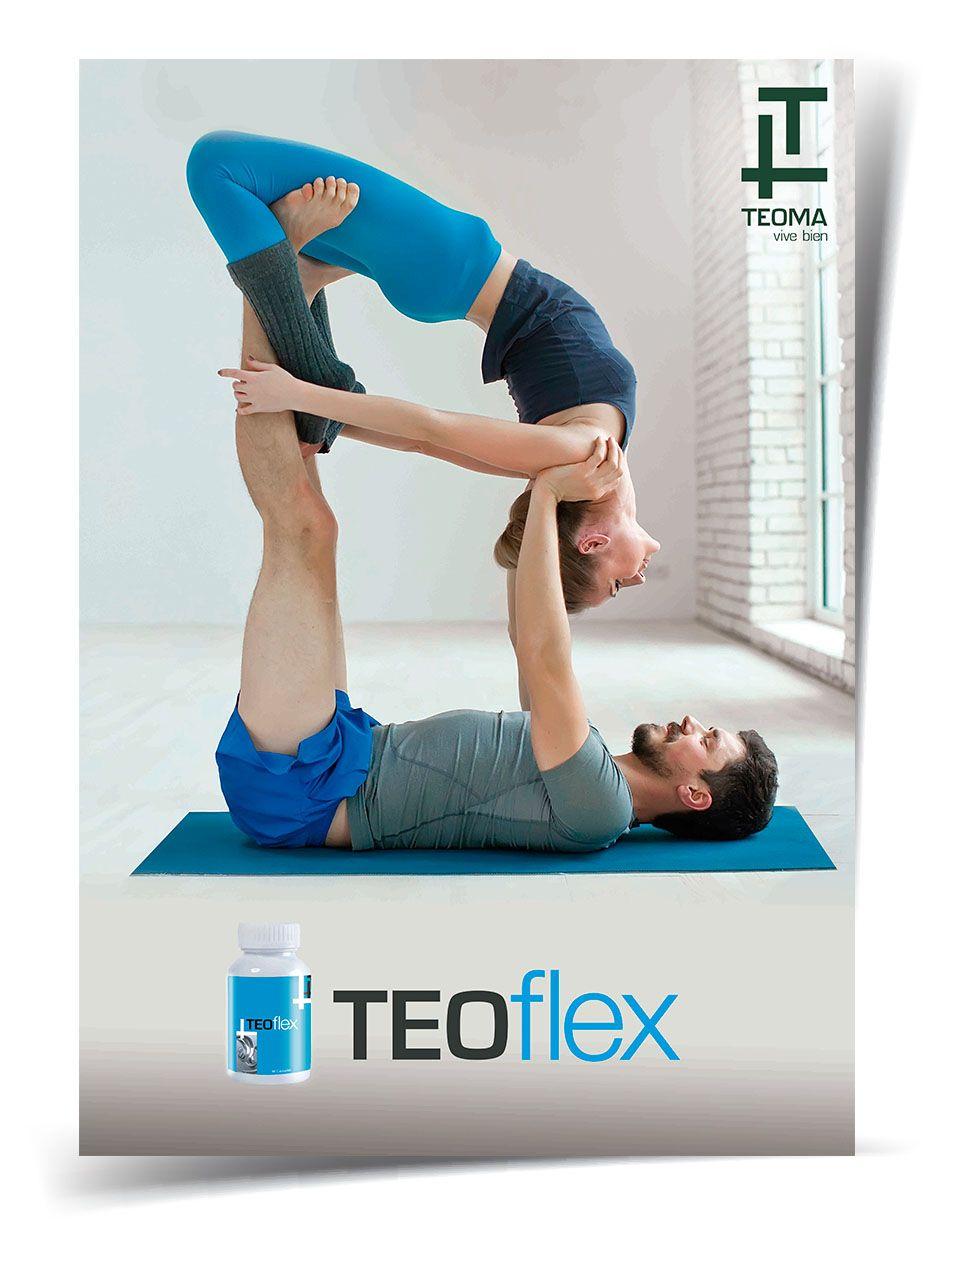 teoflex by teoma